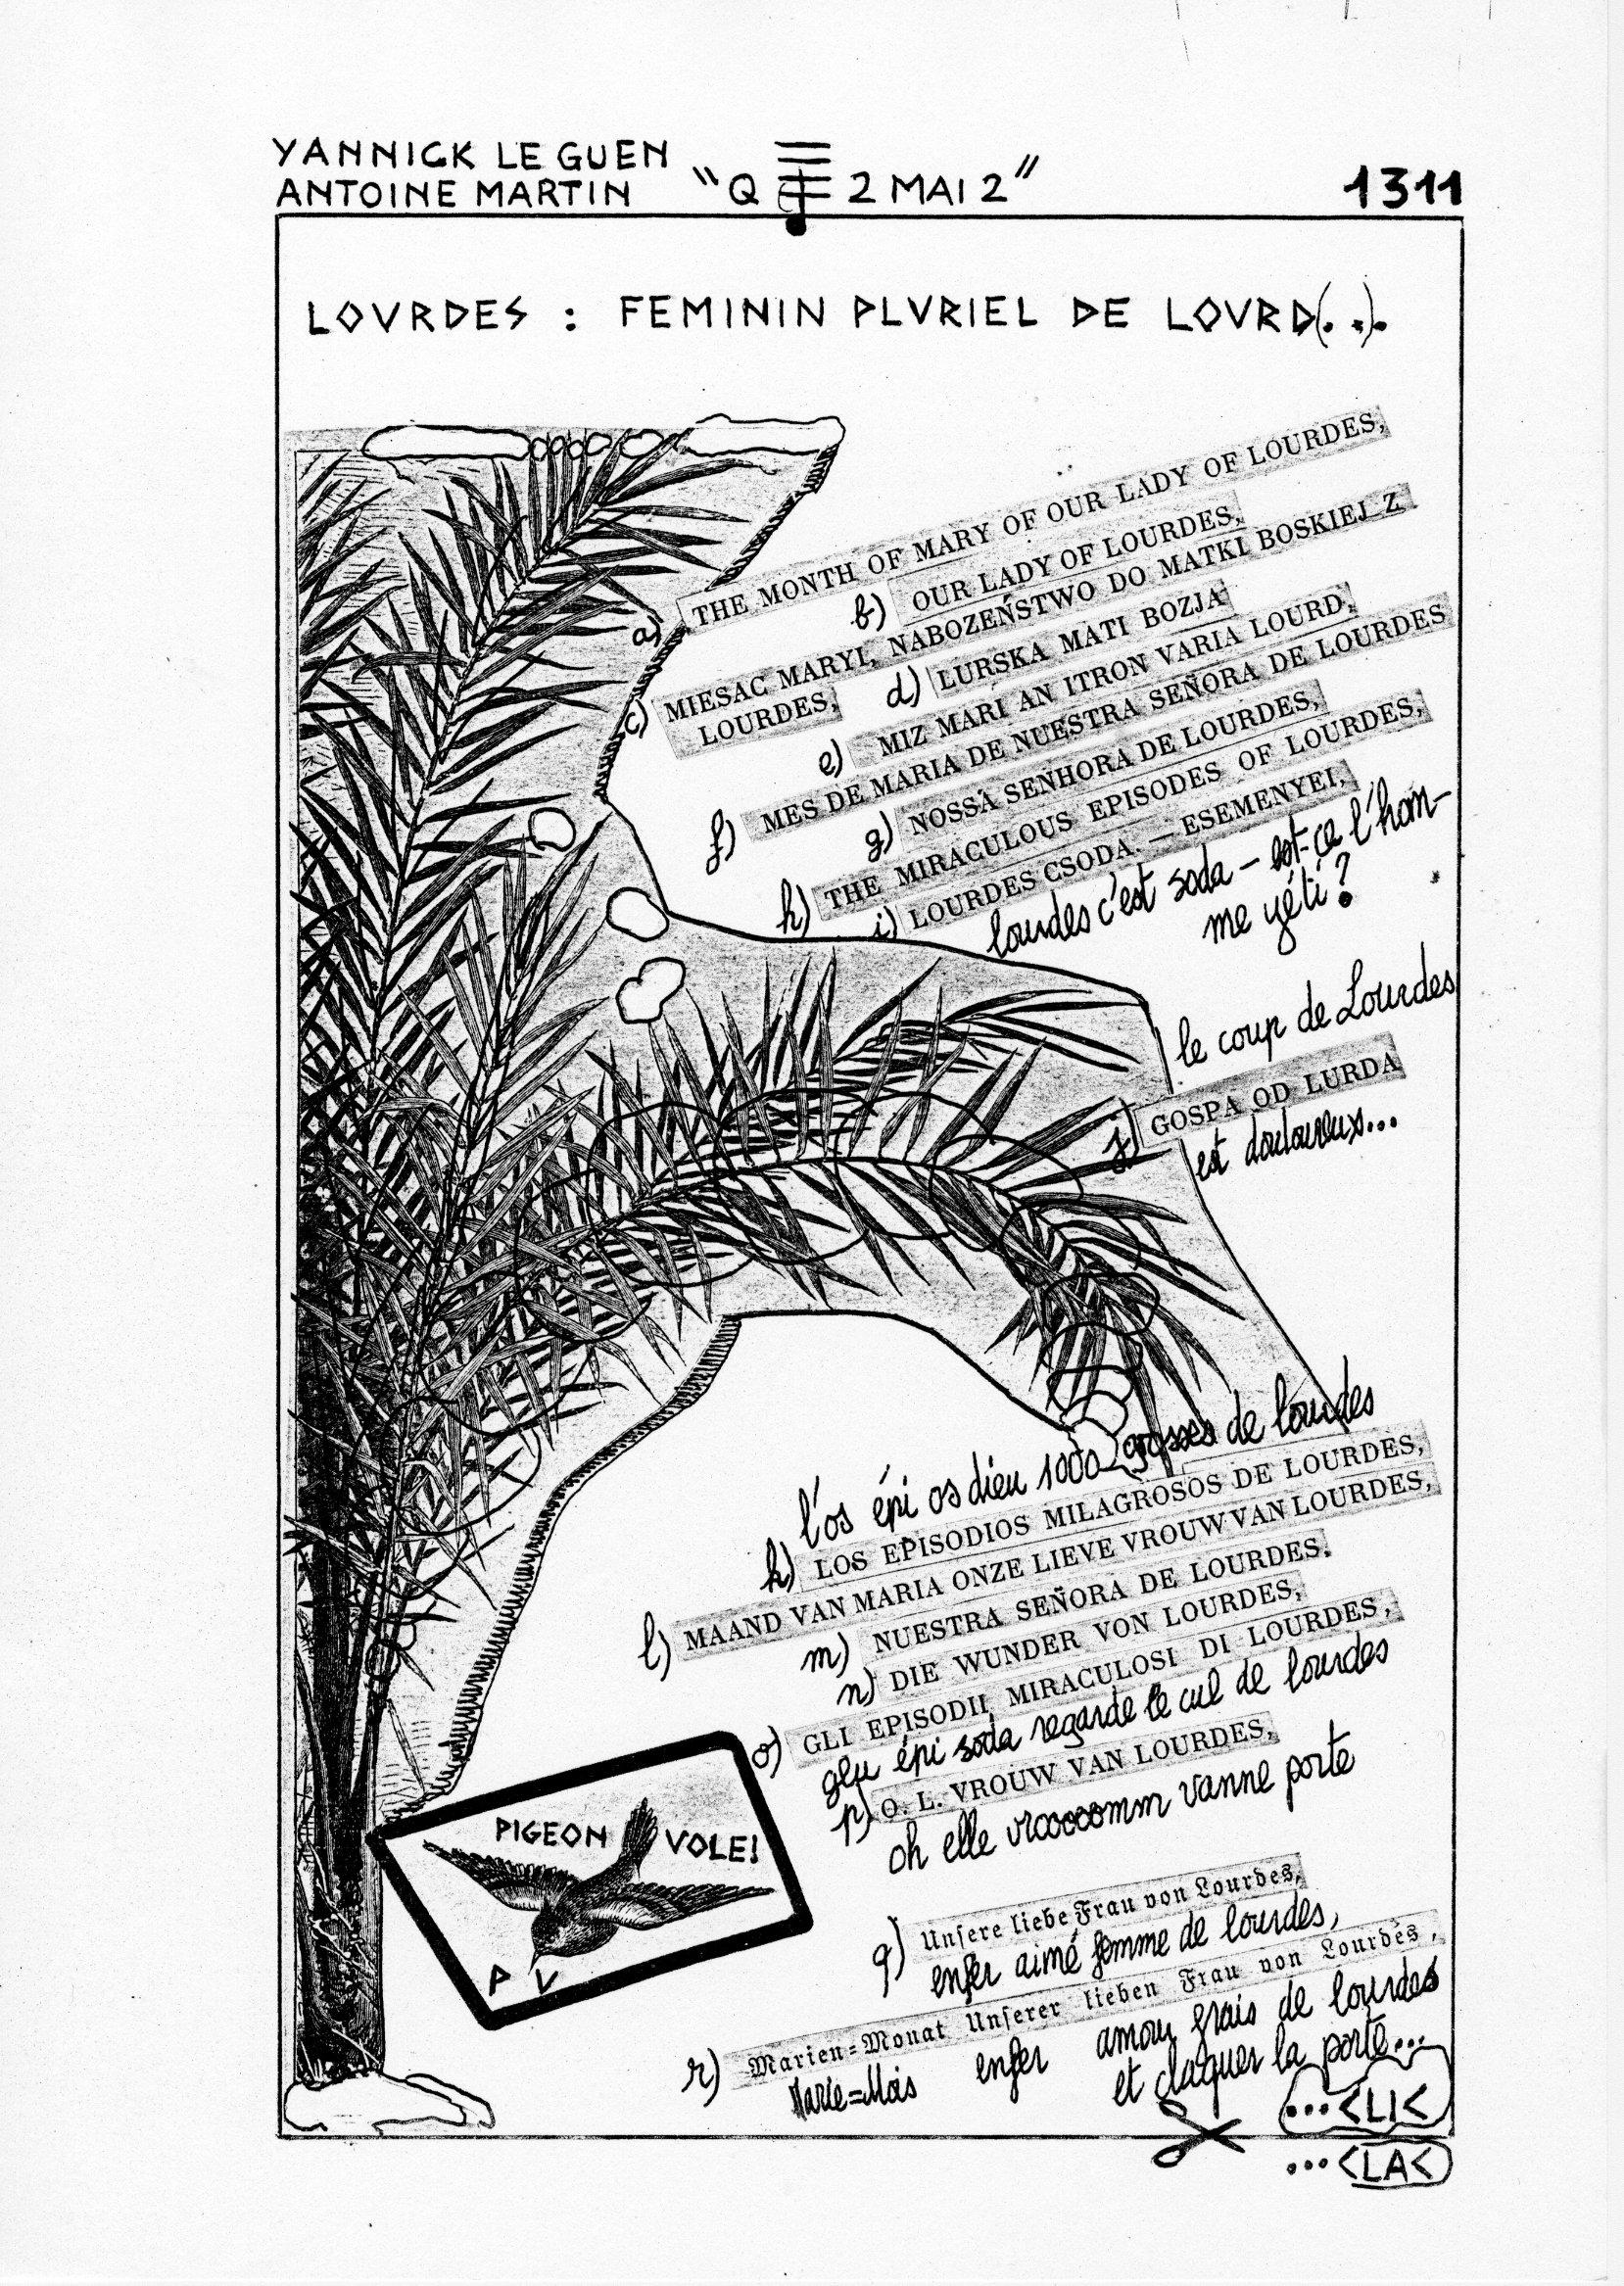 page 1311 Y. Le Guen A.Martin Q RE 2 MAI 2